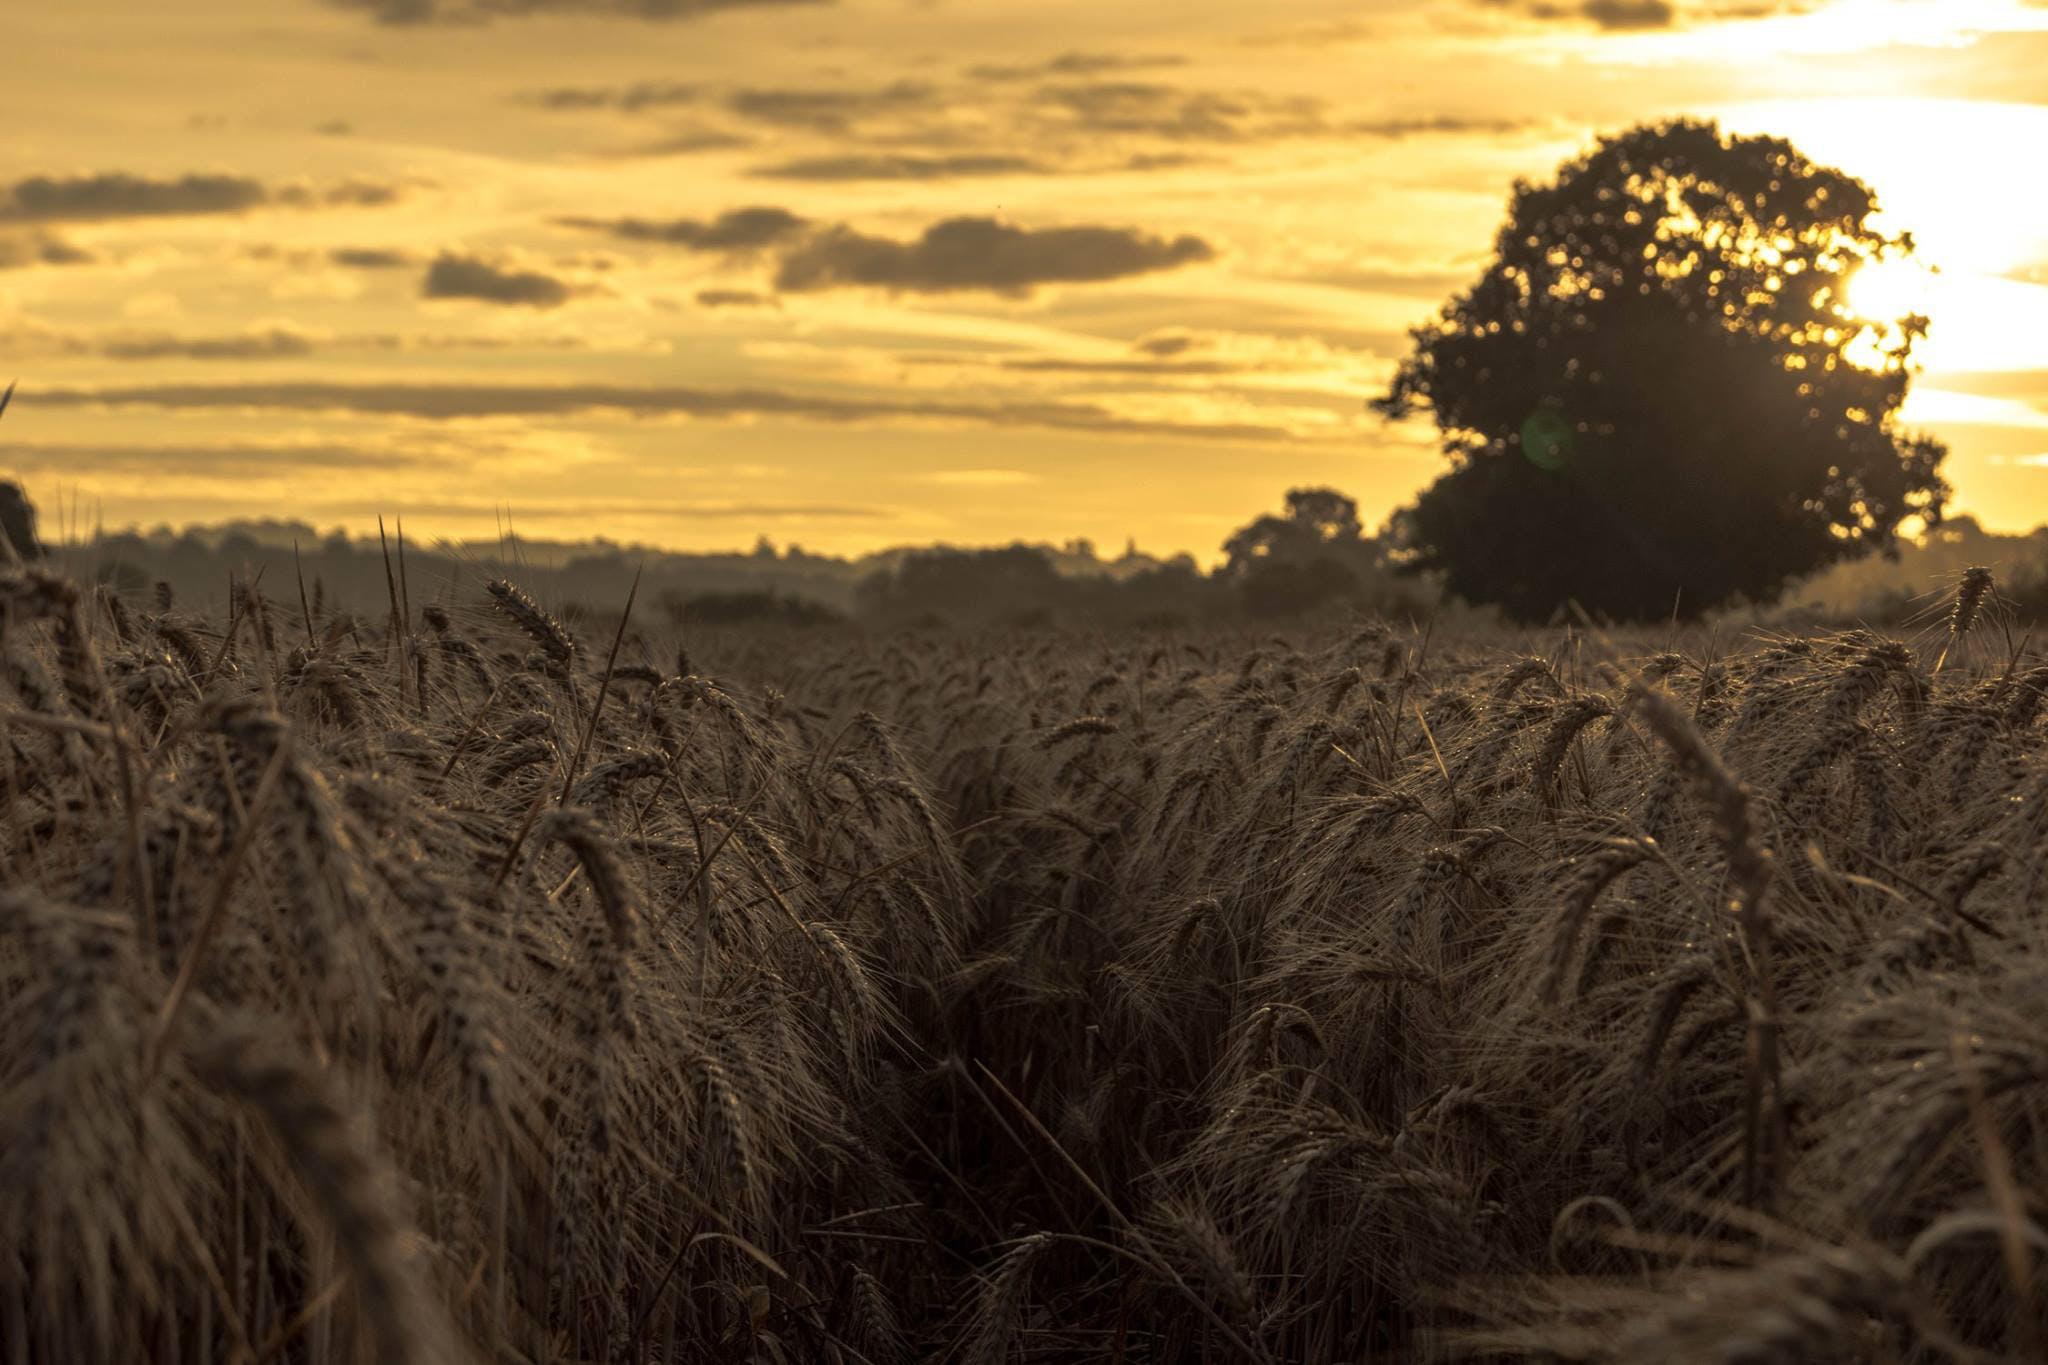 View of Grass Under Golden Hour